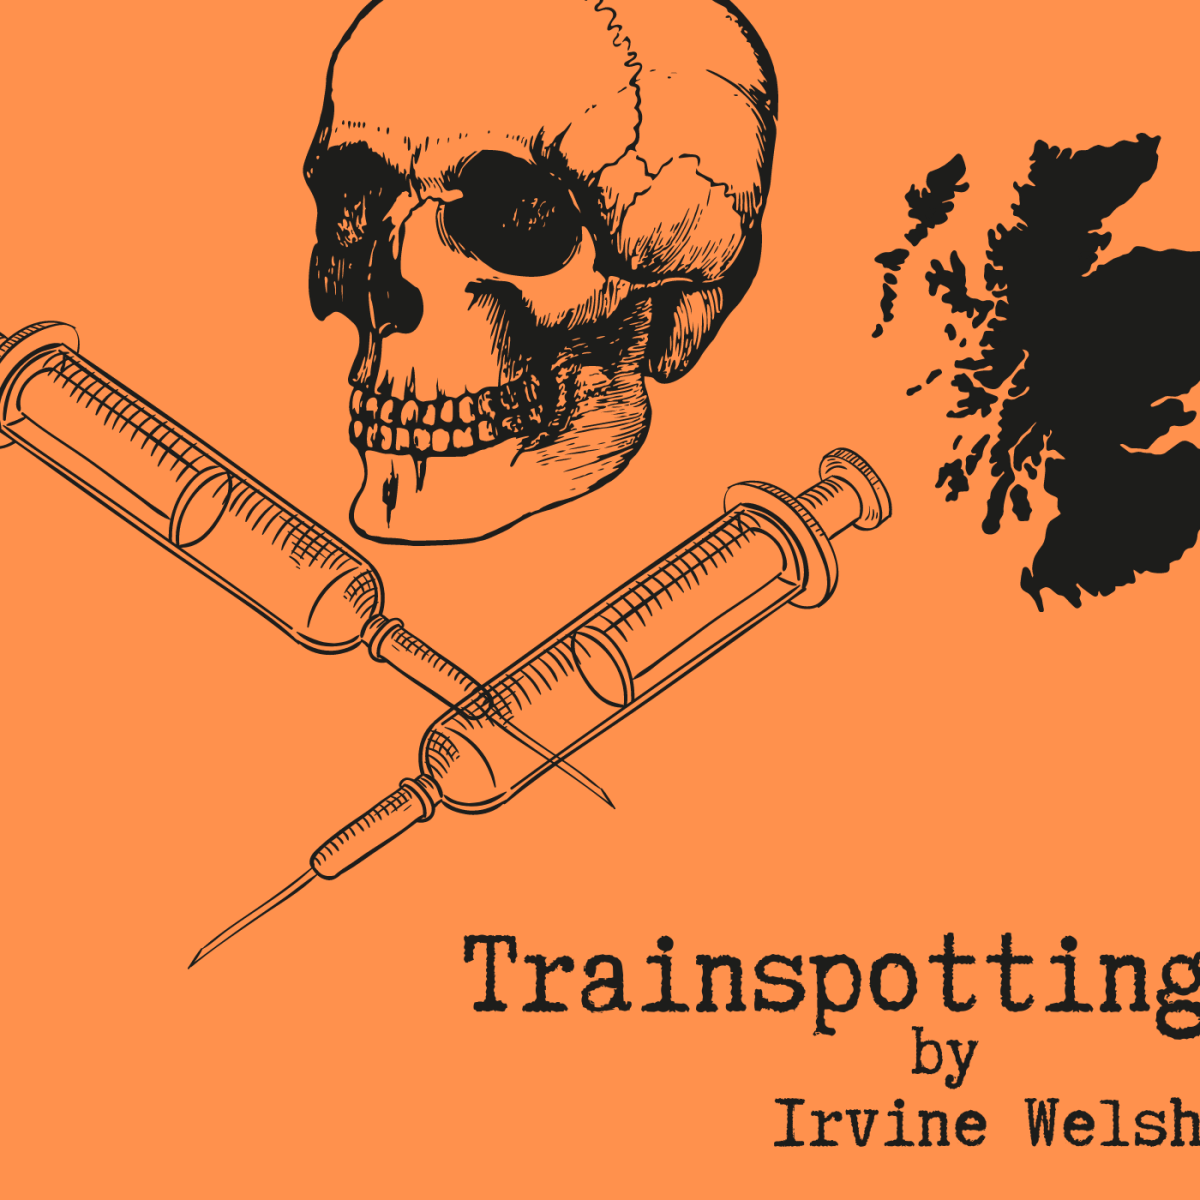 """Trainspotting"" by Irvine Welsh"